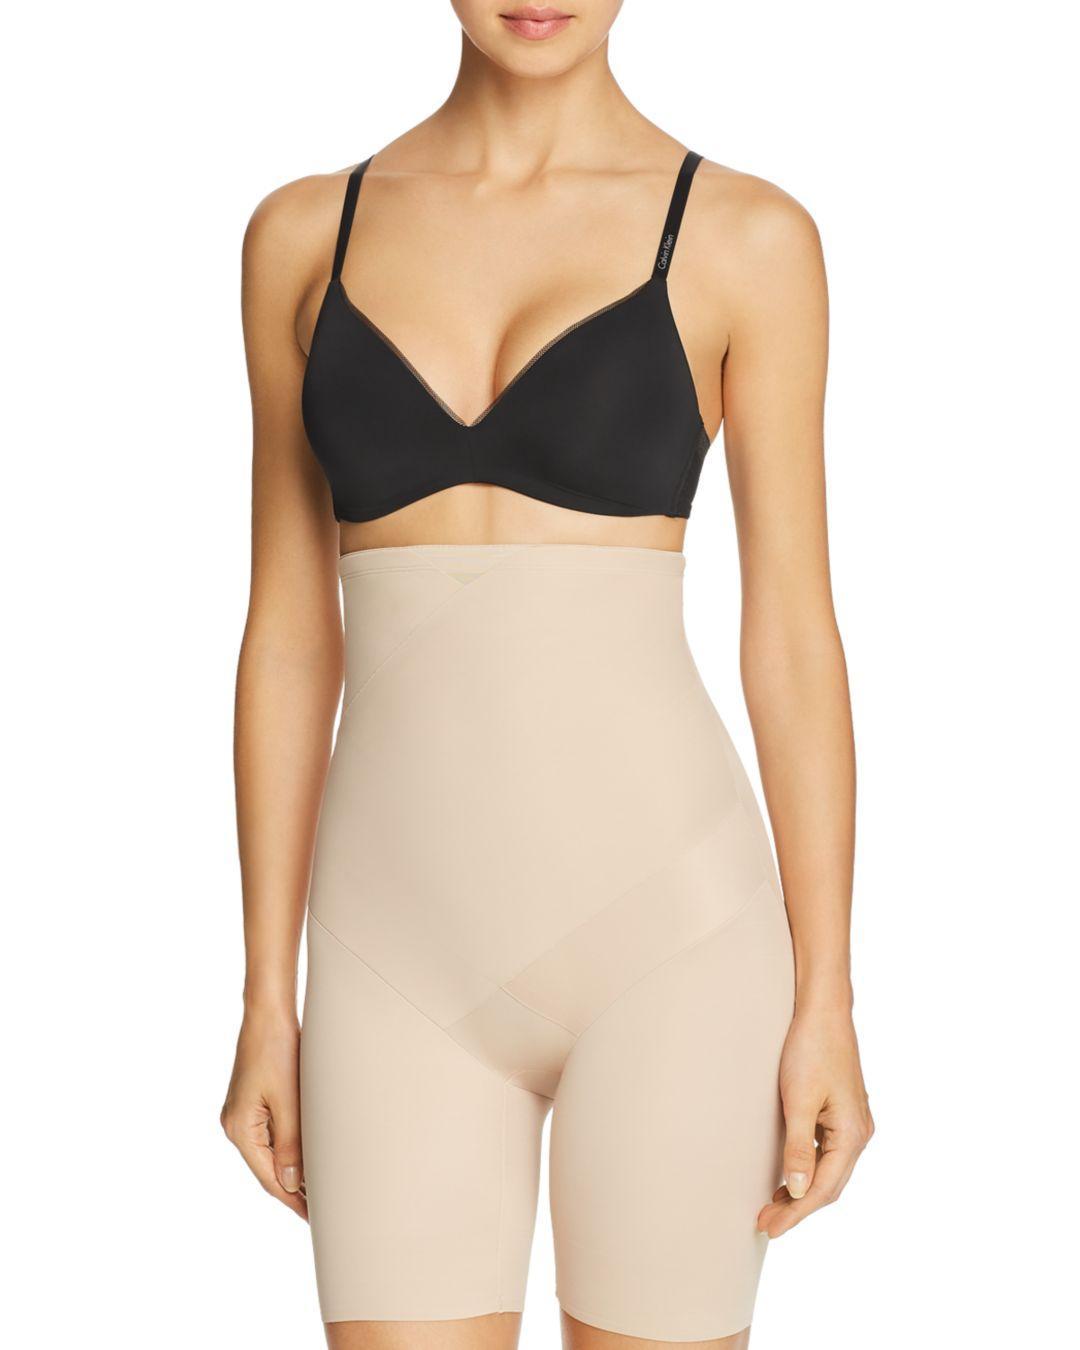 3779ae24f6e Tc Fine Intimates. Women's Natural Tummy Tux High-waist Thigh Slimmer Shorts